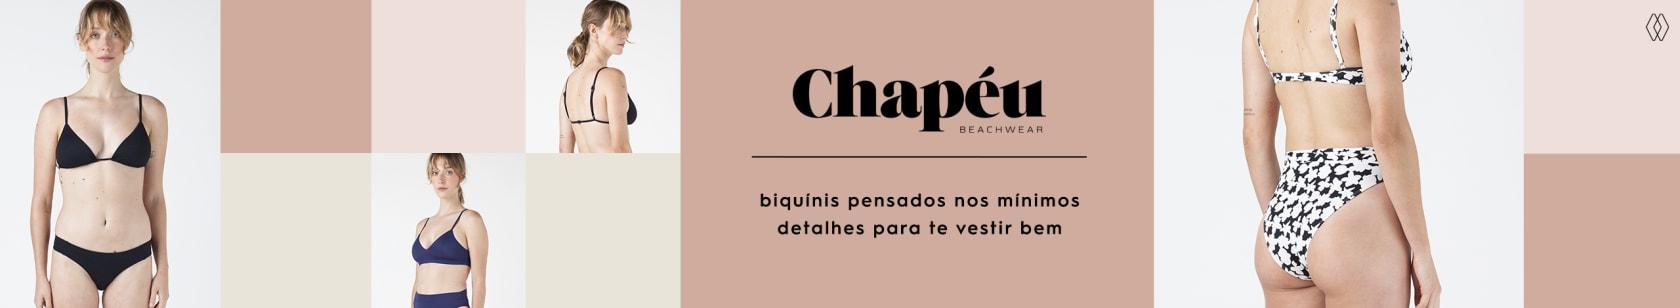 CHAPÉU BEACHWEAR | AMARO